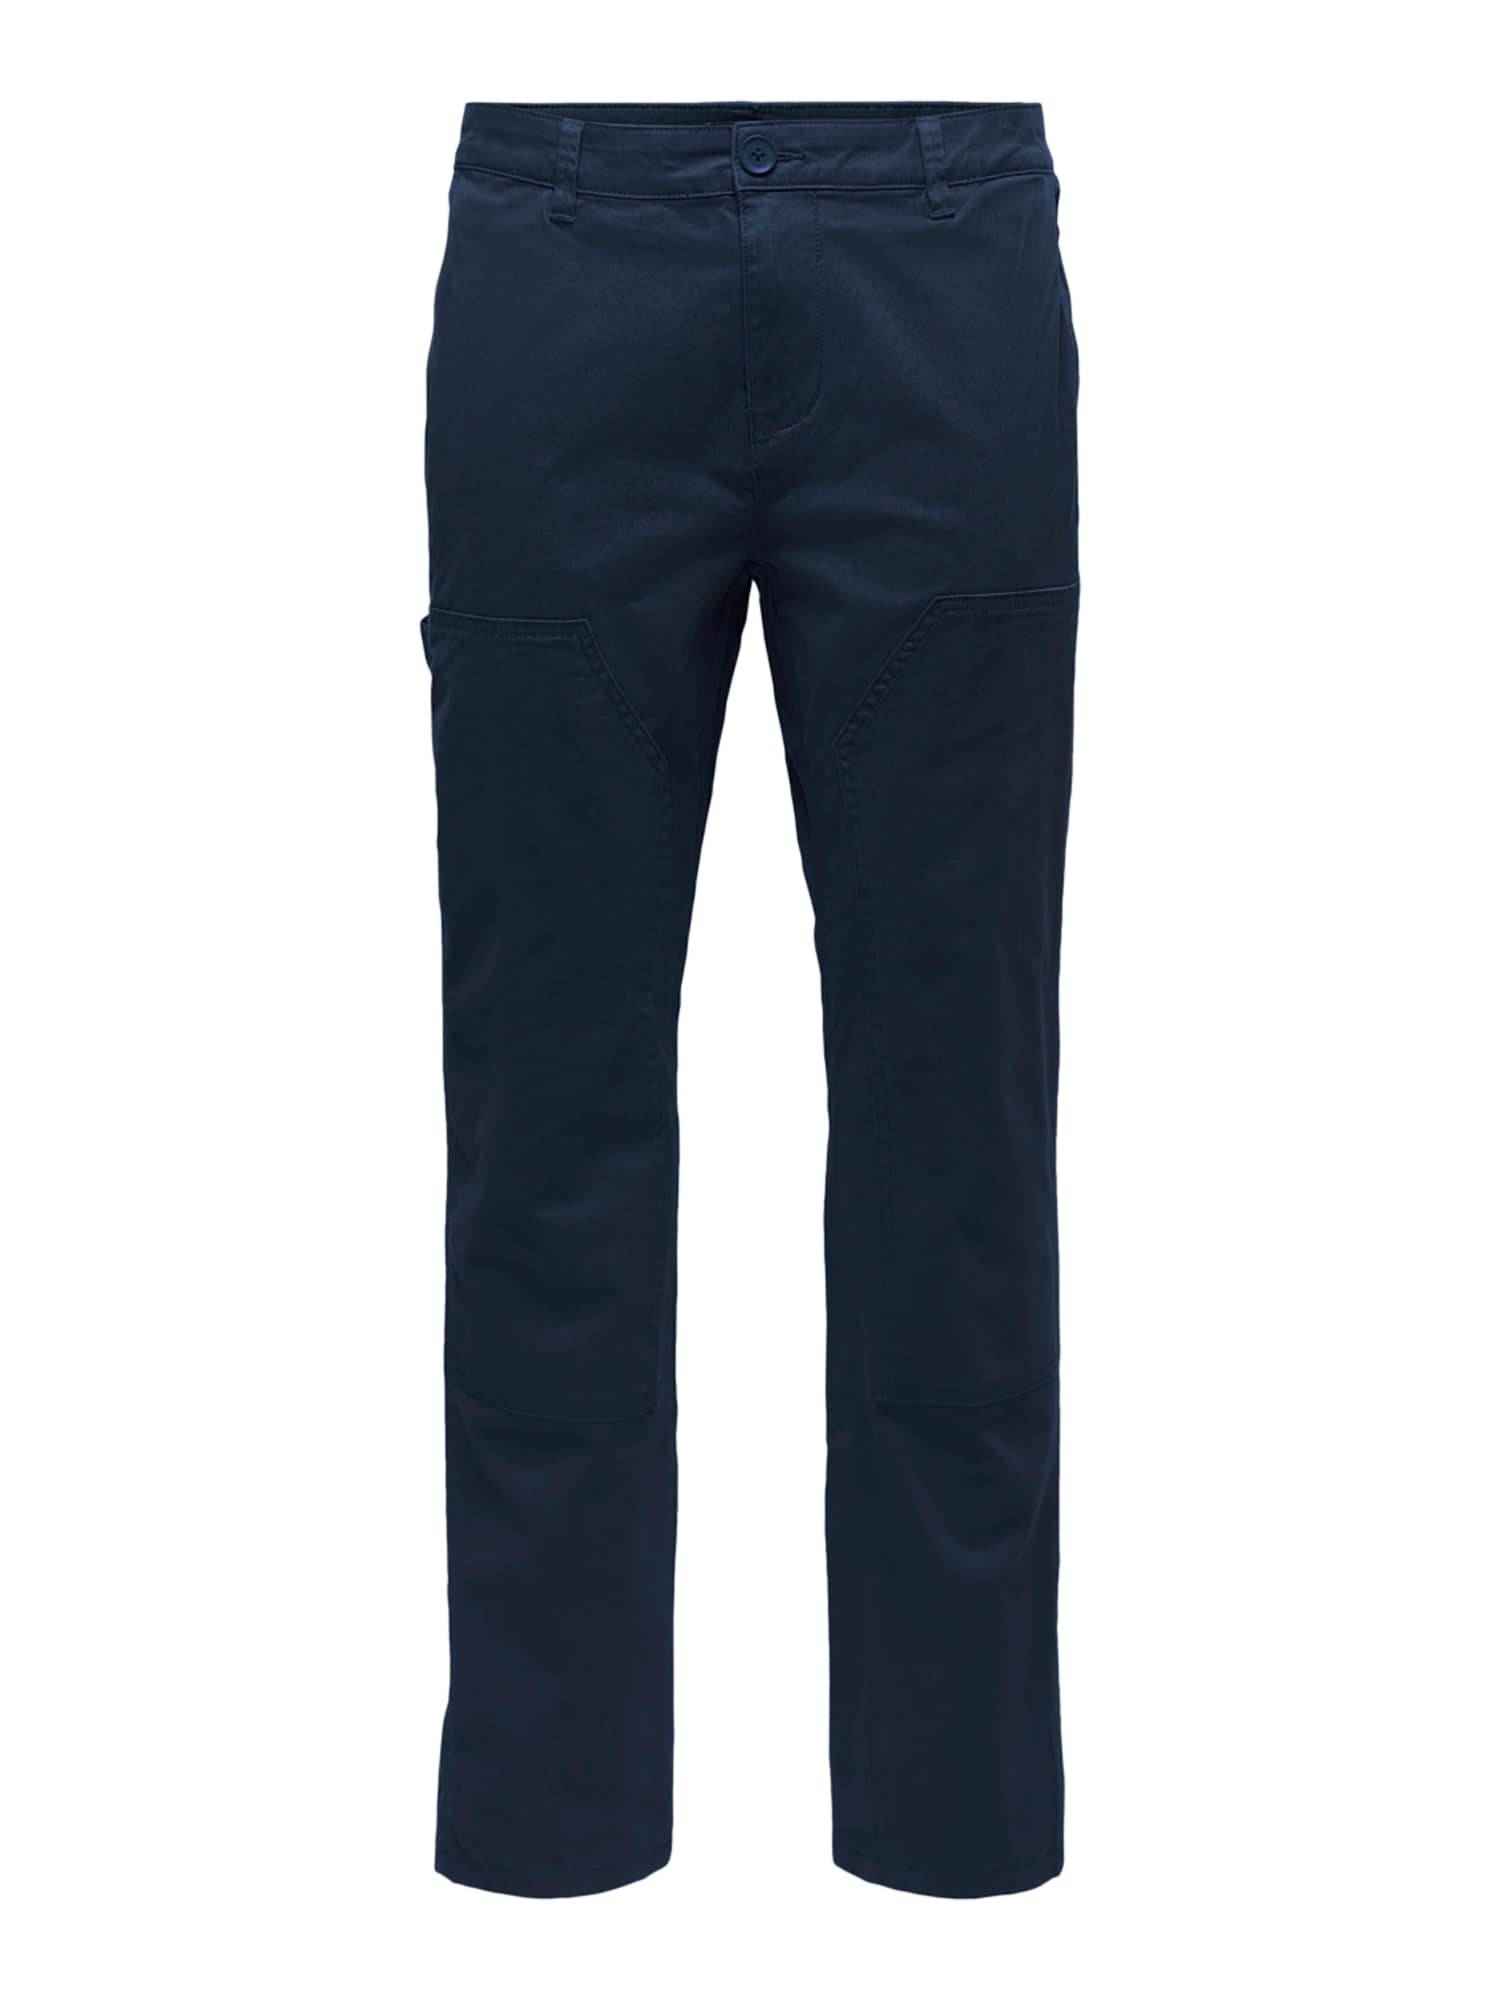 Only & Sons Pantalon 'Cam'  - Bleu - Taille: 34 - male